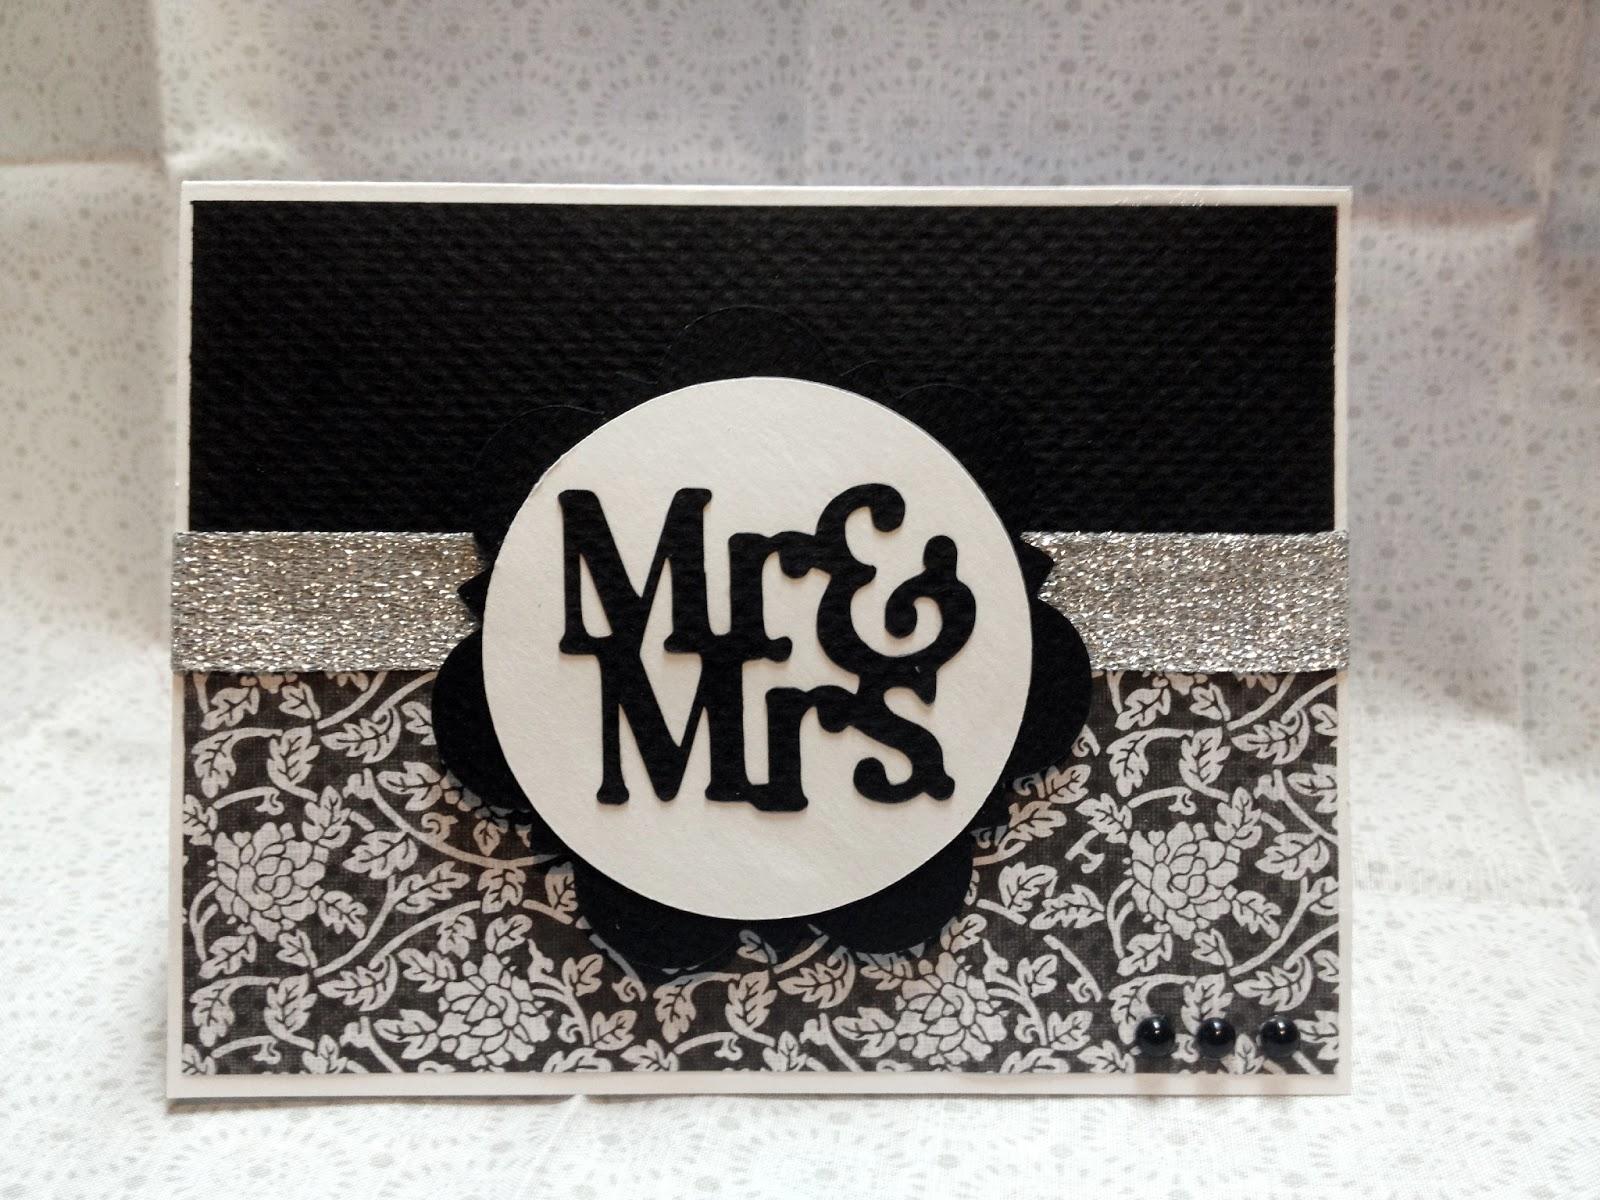 How to scrapbook wedding cards - Mr Mrs Wedding Card Using Artiste Cricut Cartridge